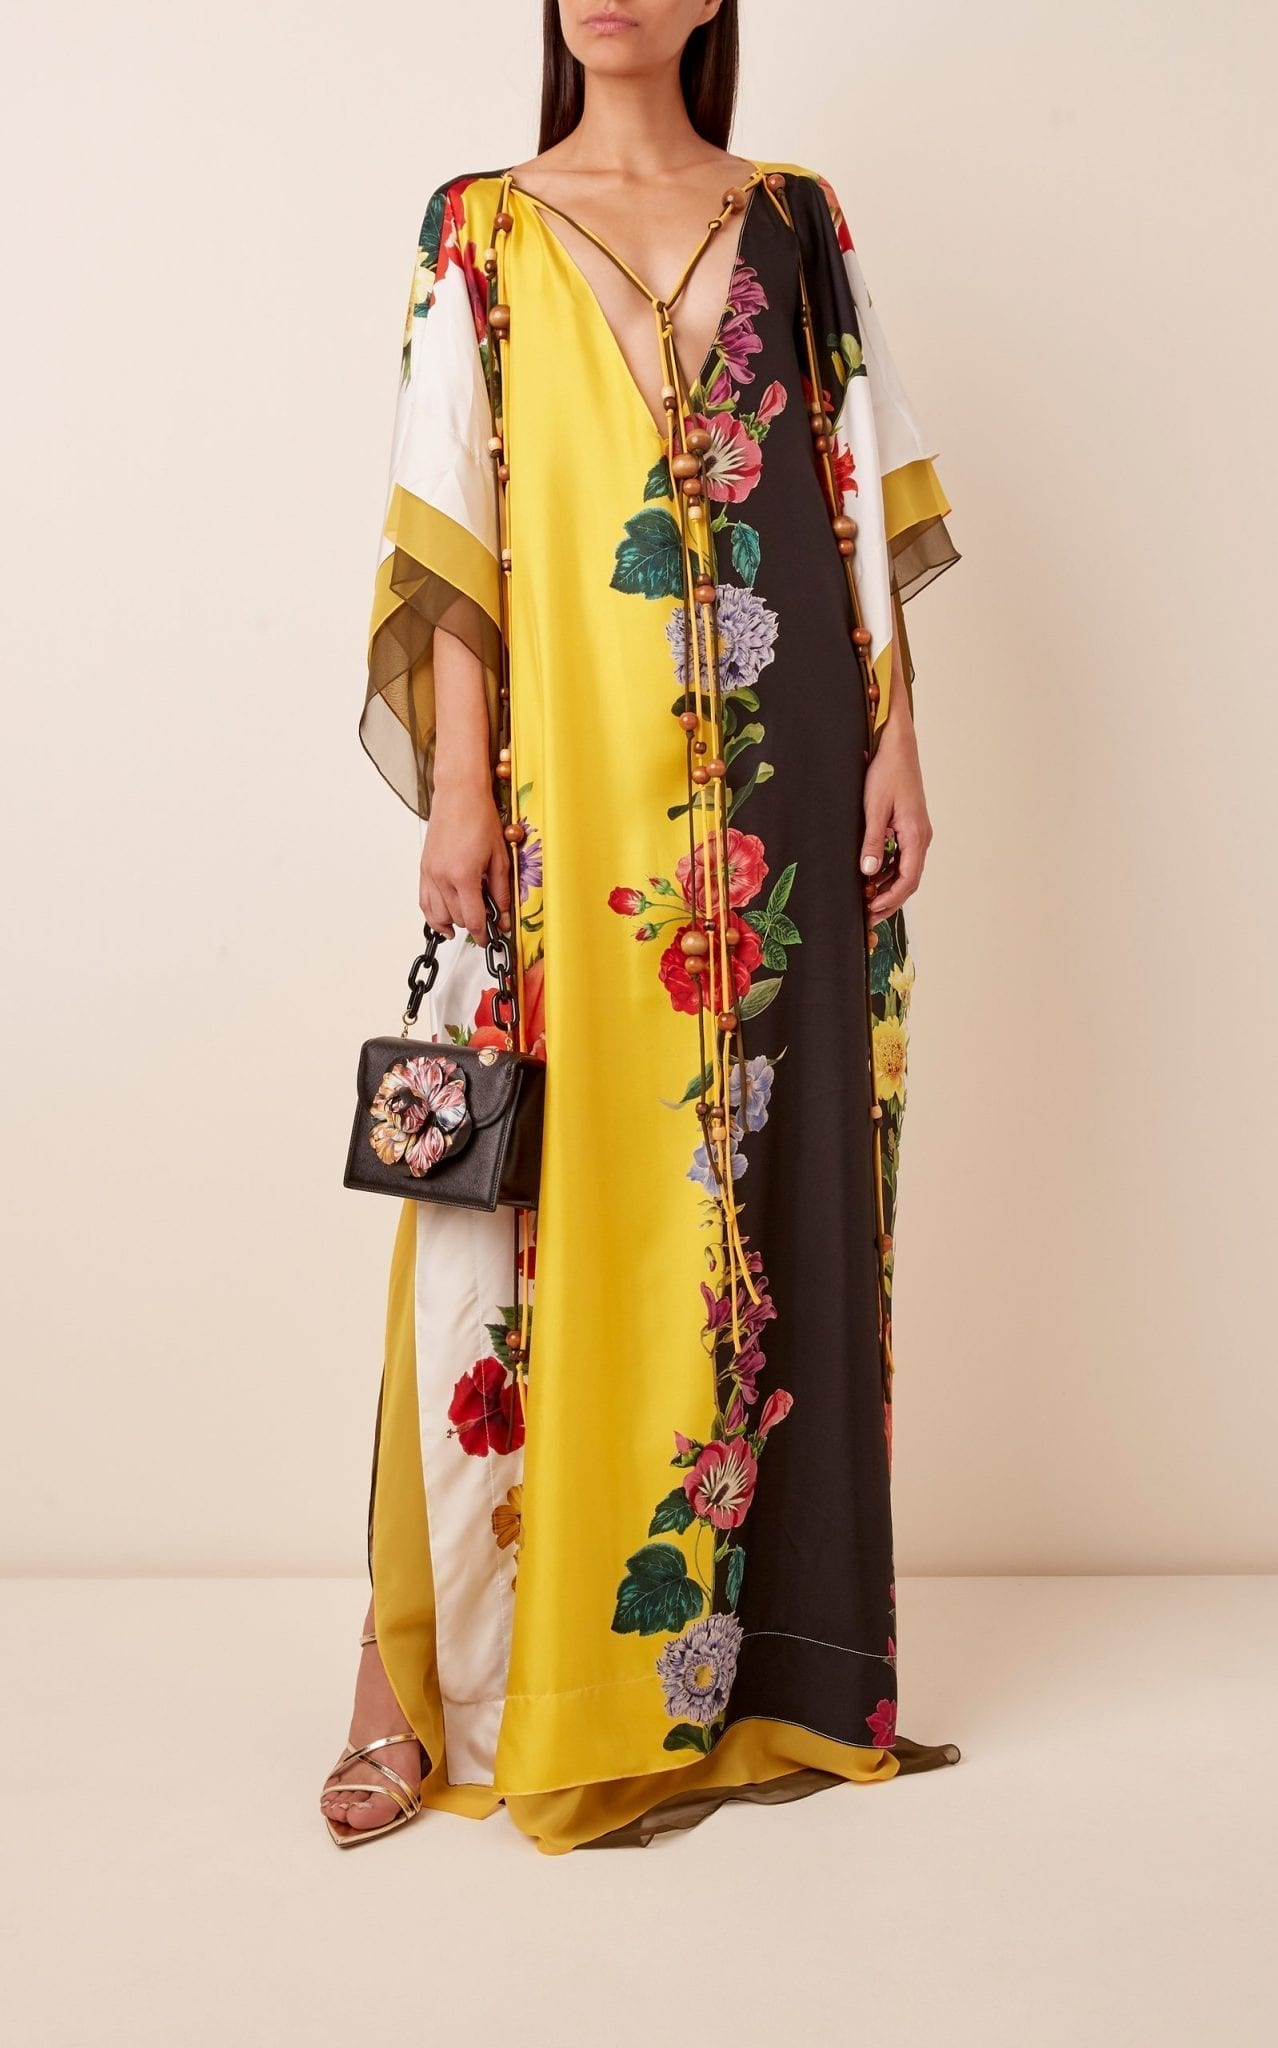 OSCAR DE LA RENTA Floral-Print Silk Caftan Dress